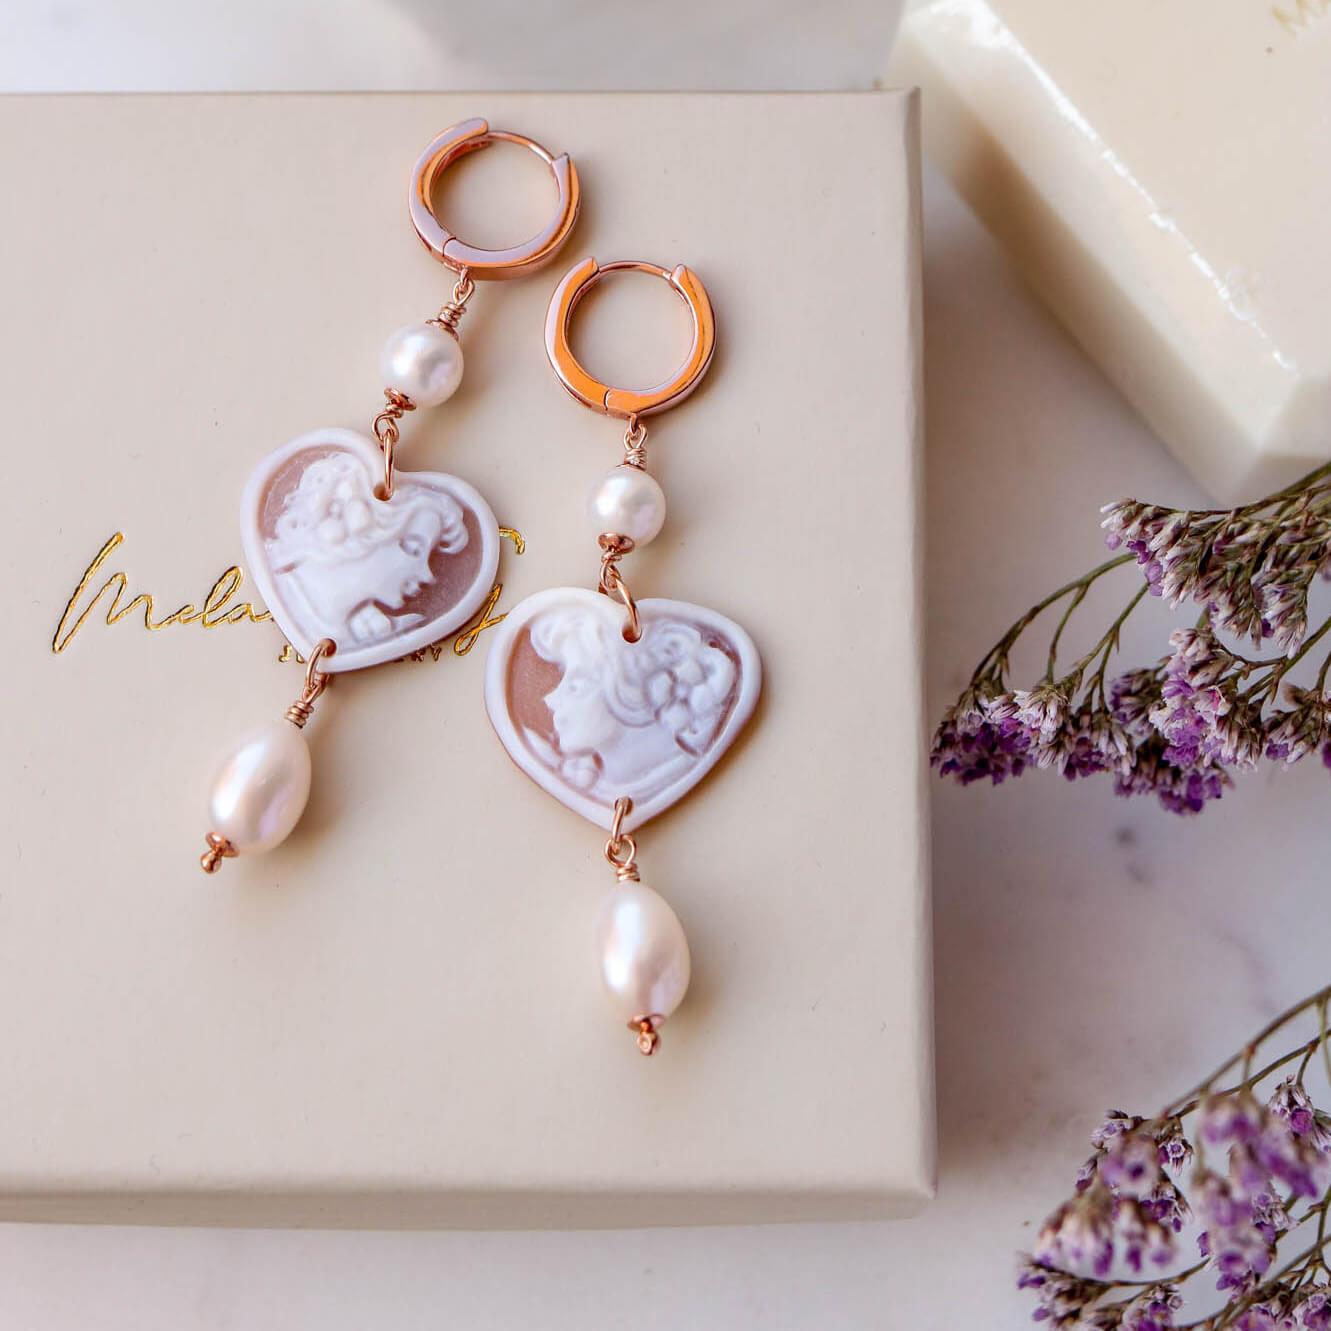 Melania Gorini Jewelry emporio mida